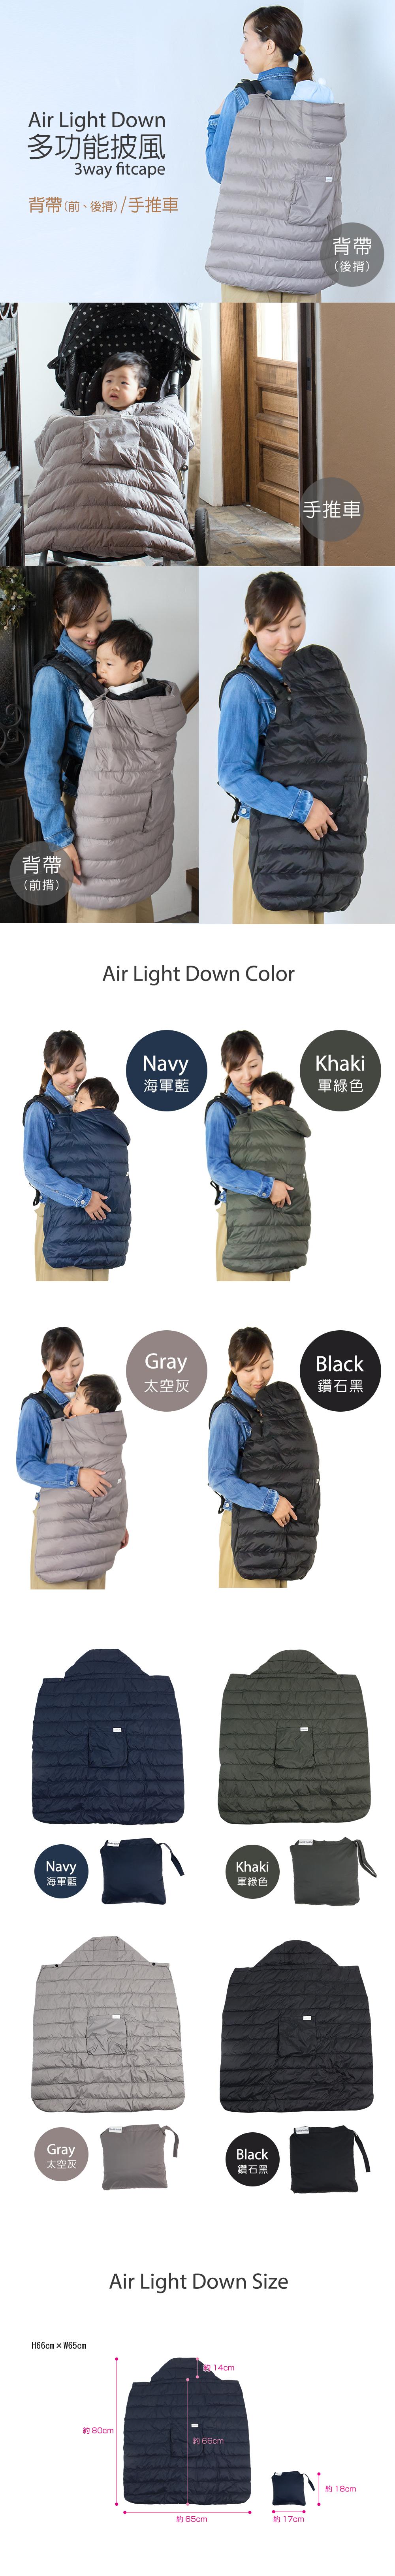 baby-carrier-cover 防風保暖背帶/推車披風 羽絨披風 多功能披風